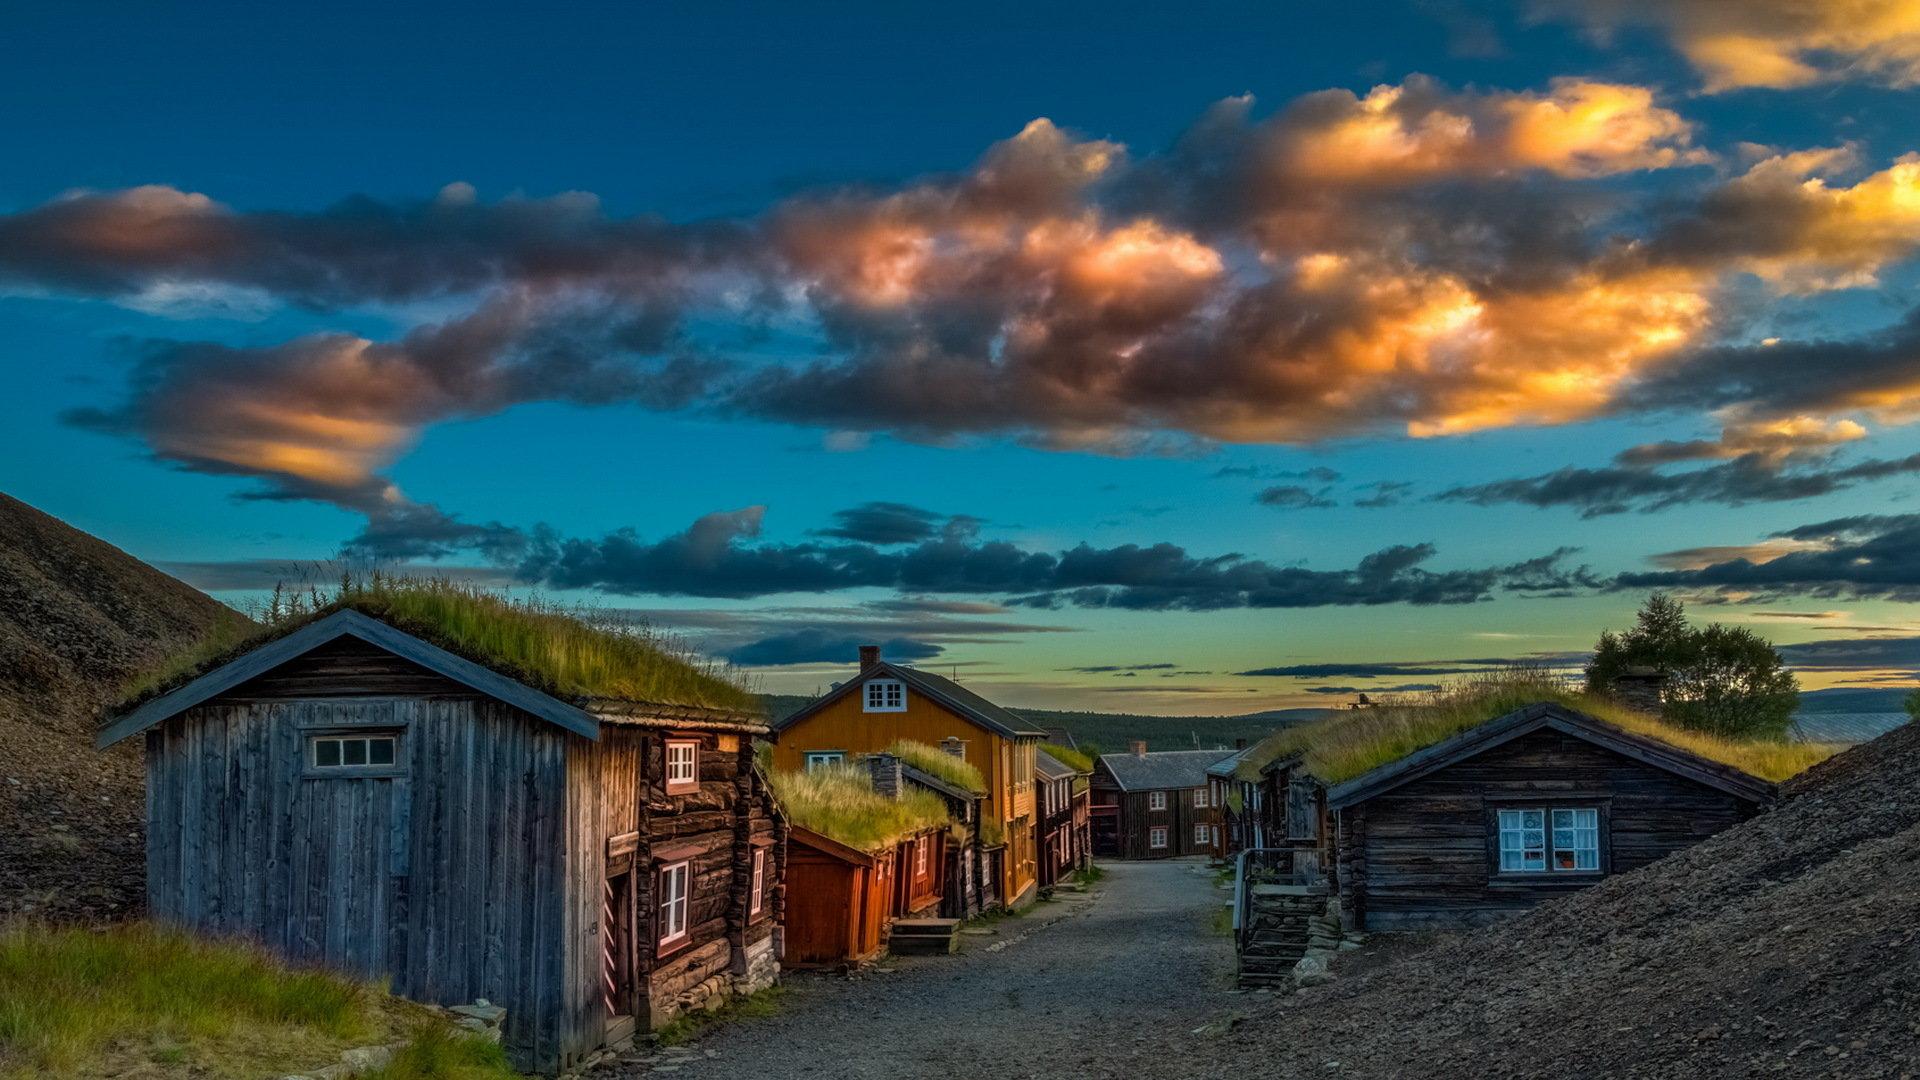 Norway wallpapers HD for desktop backgrounds